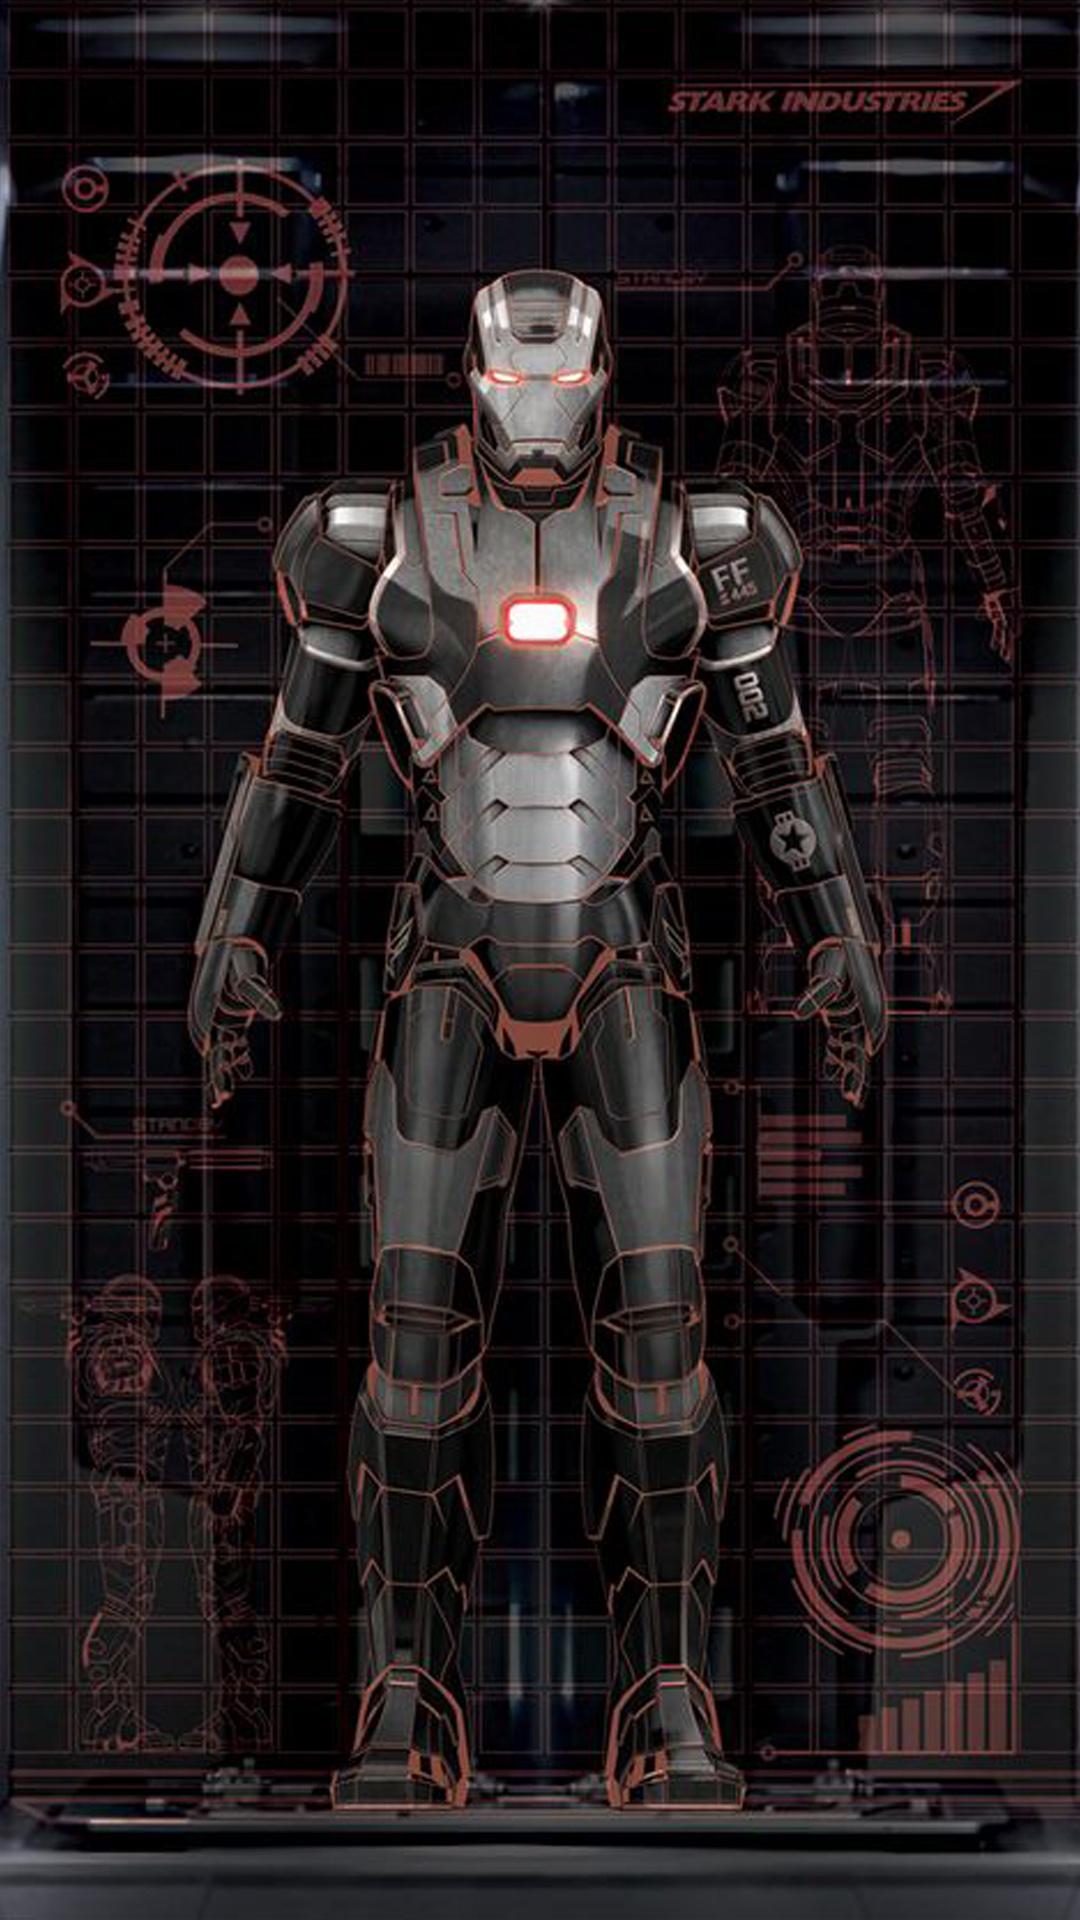 Iron Man Wallpaper For Mac